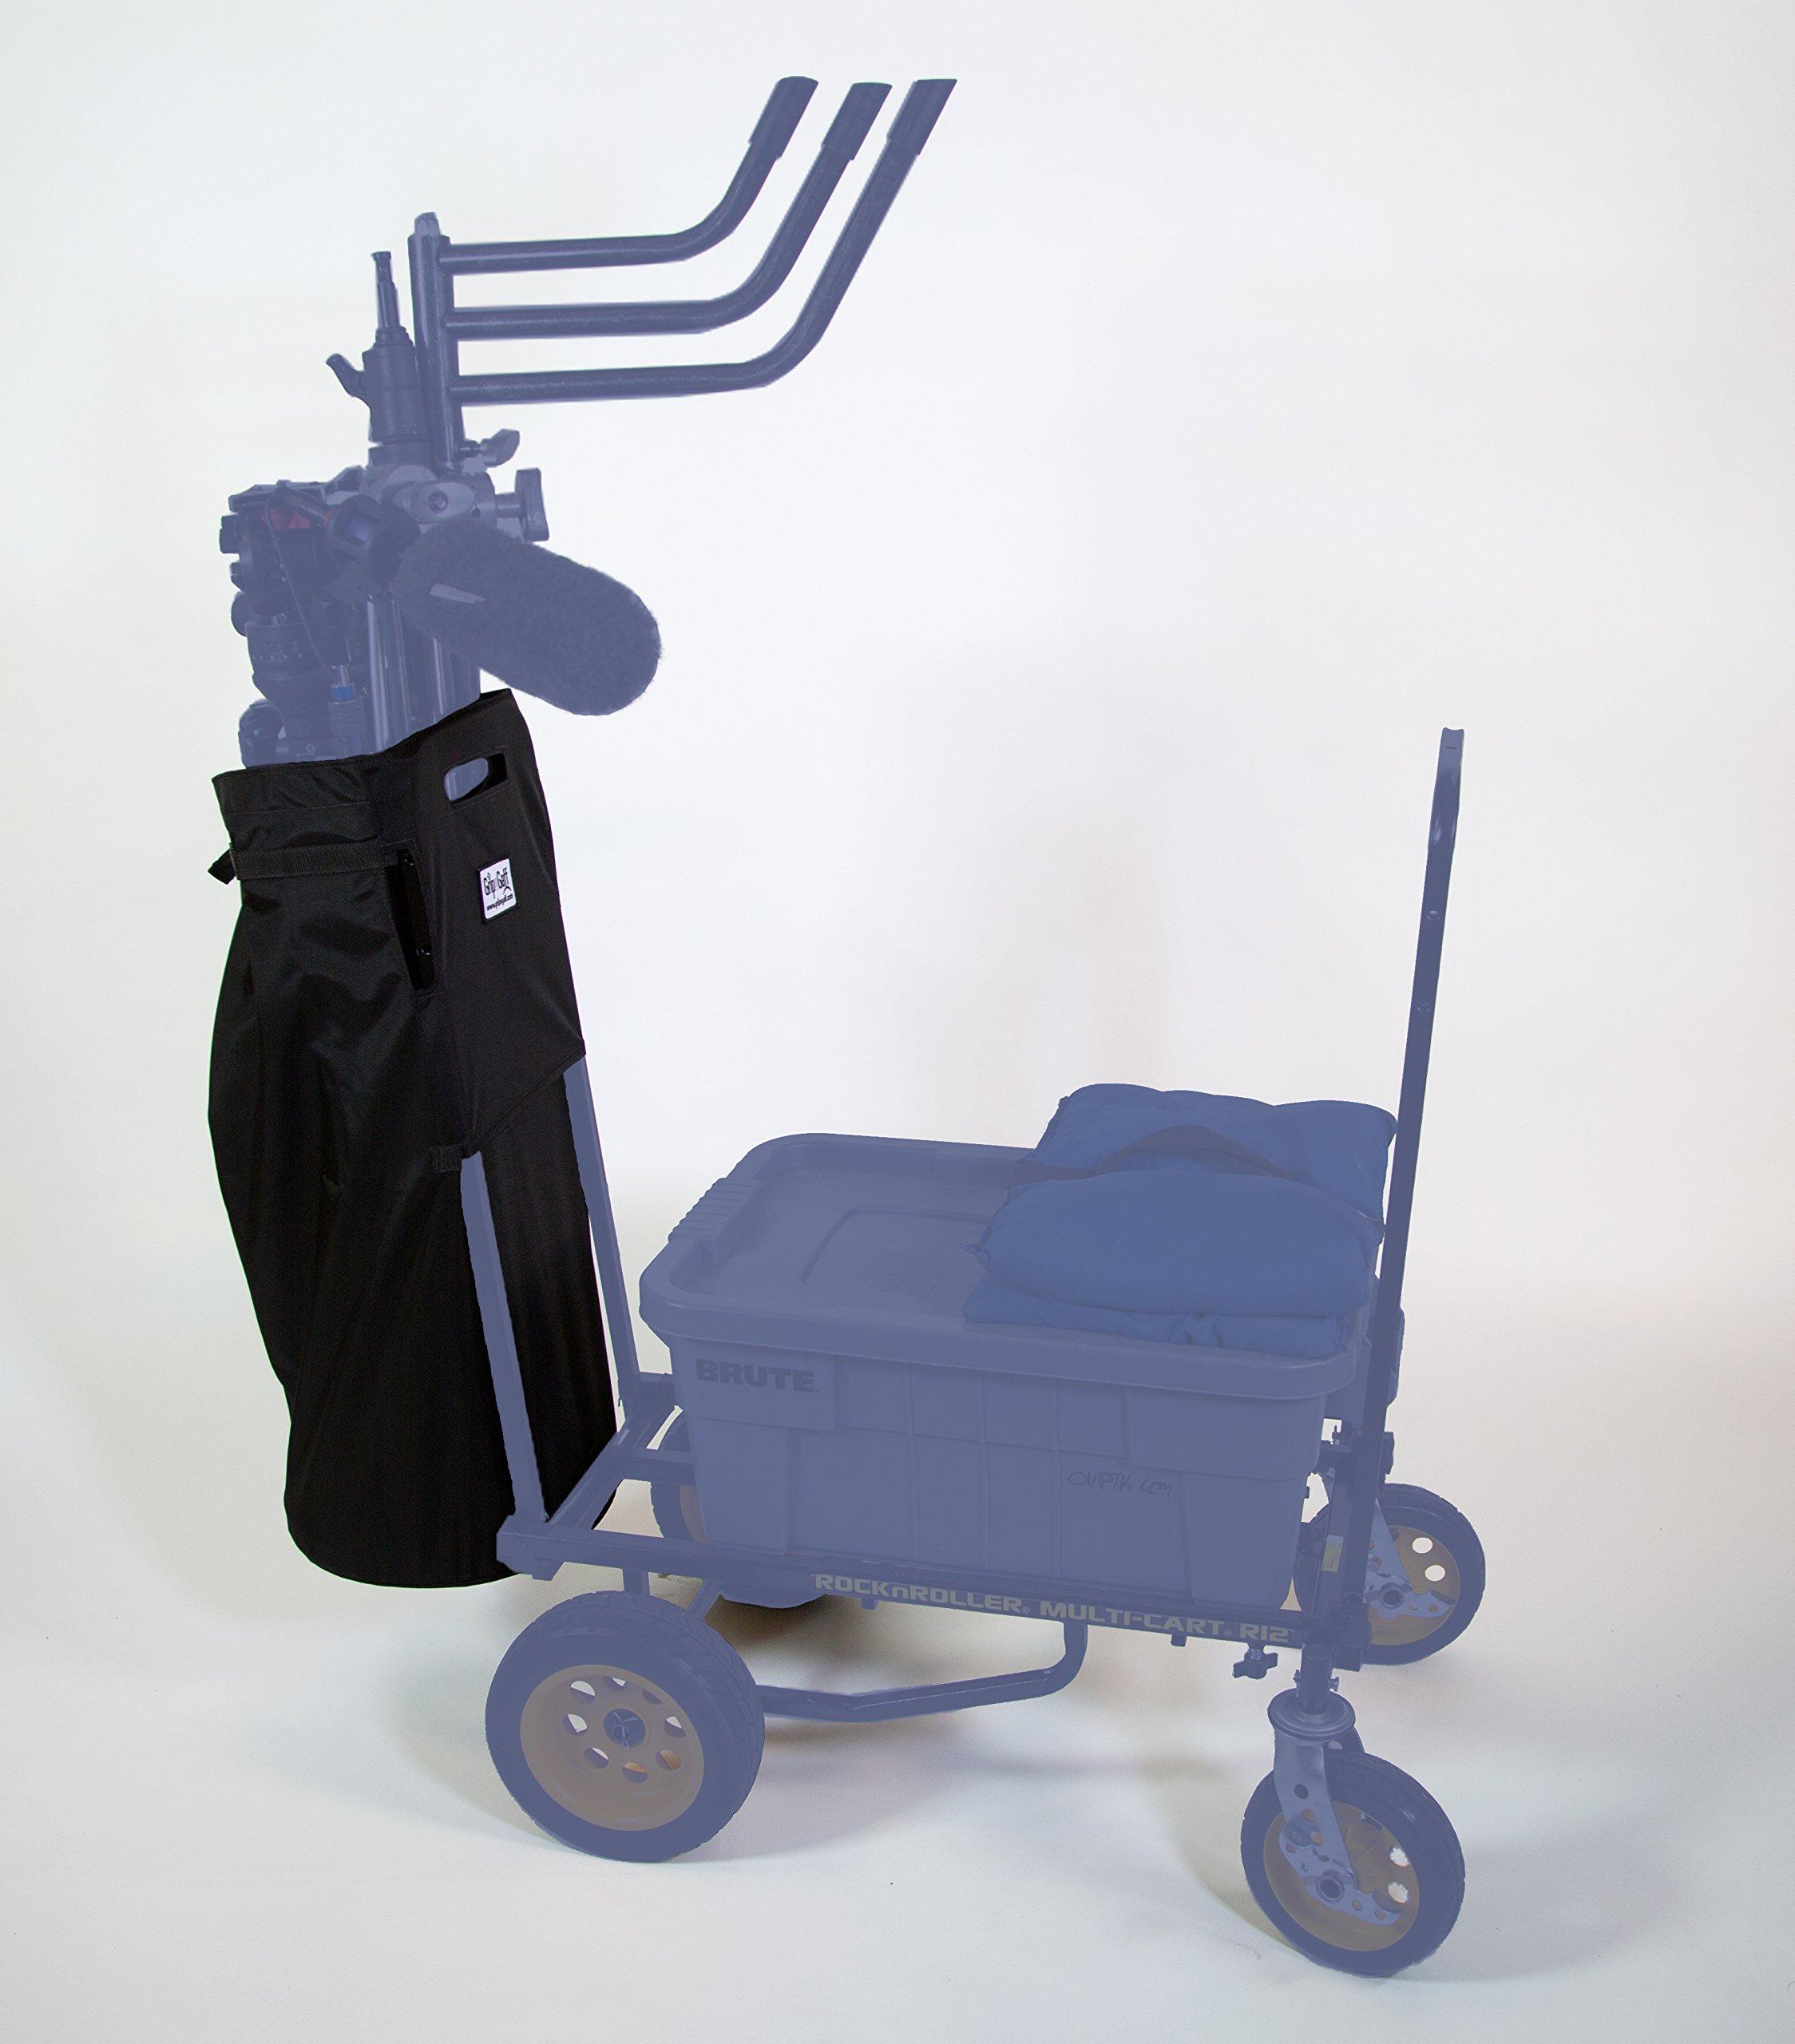 GripnGaff Bag Version 2.0 for RocknRoller R8RT, R10RT, R12RT & R16RT Multi-Cart